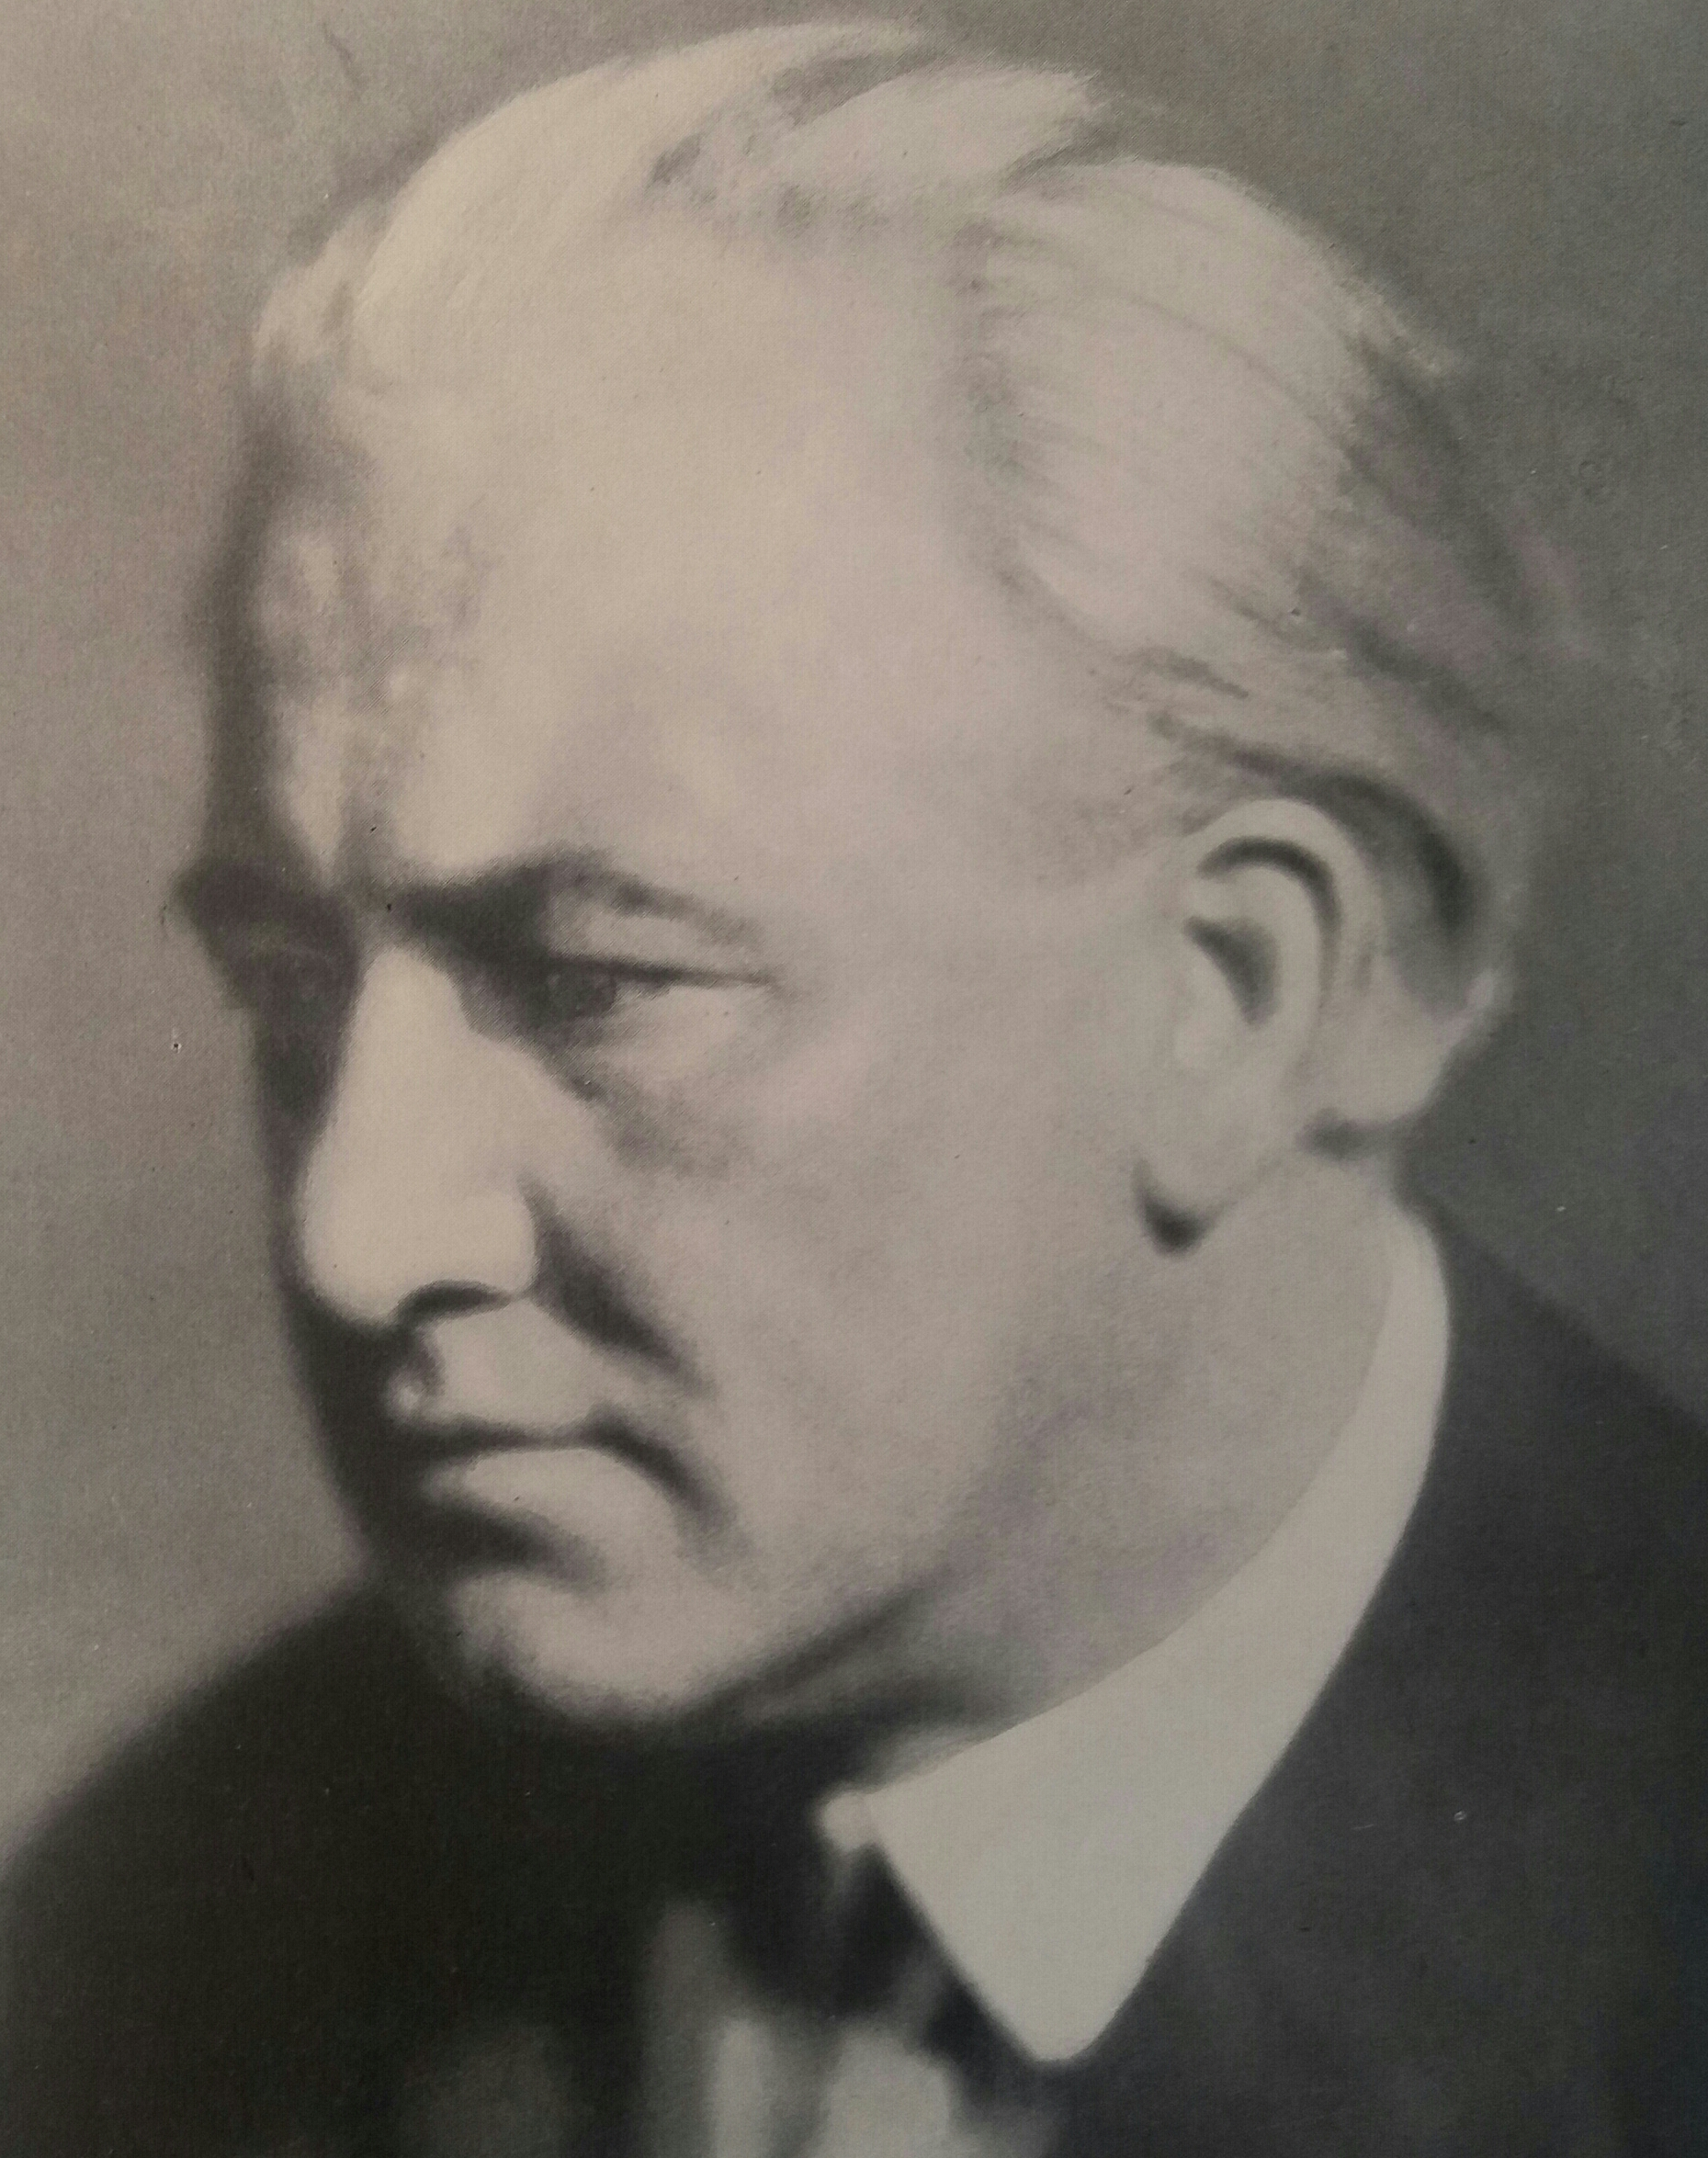 Jan Bor, Czech Theatre Director (original photo taken around 1930)